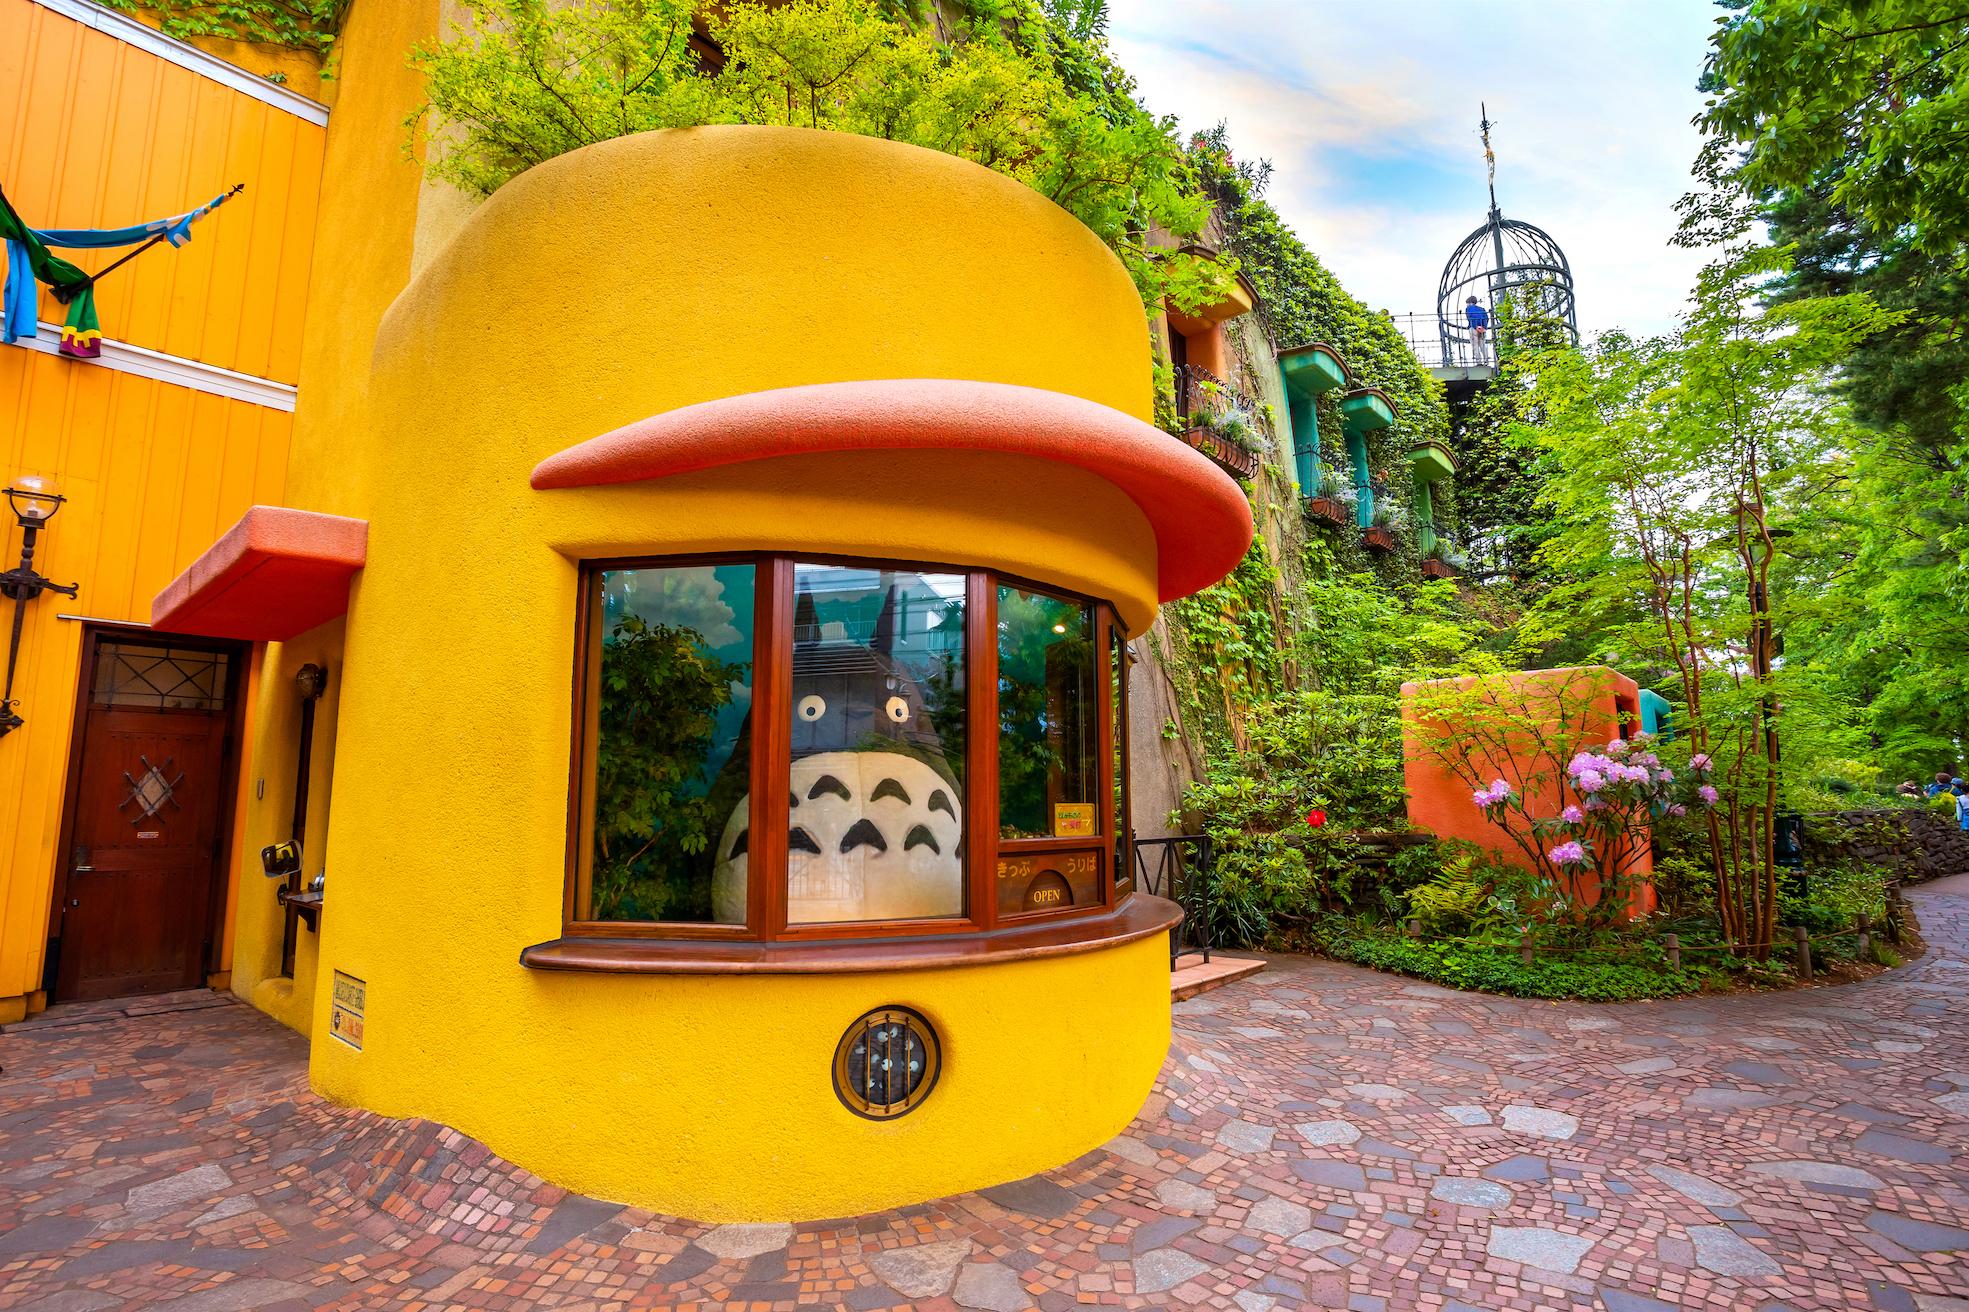 Visit Tokyo's Ghibli Museum via virtual tour now